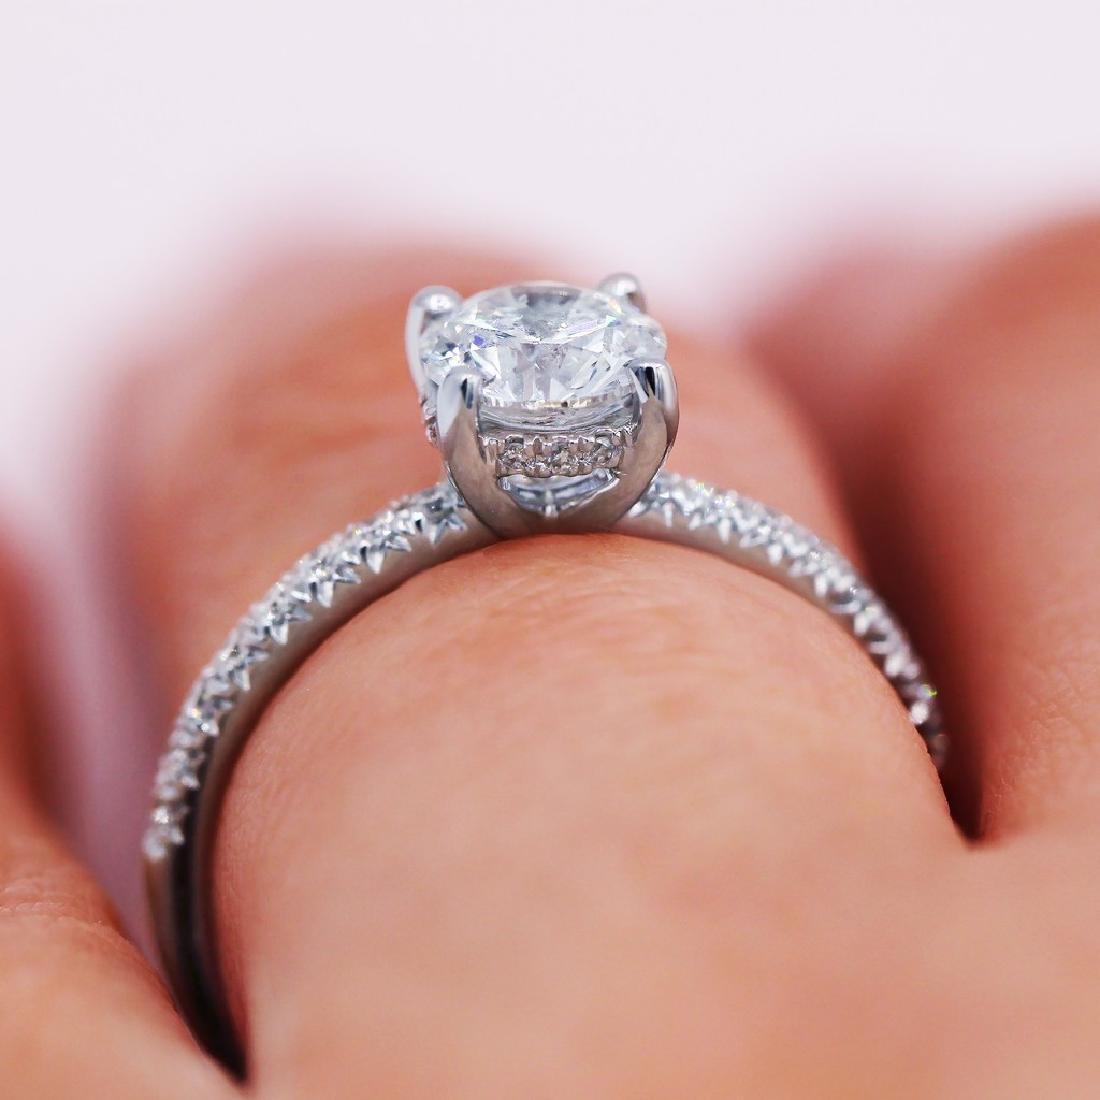 Sparkling 1.03 TCW round cut diamond pave engagement - 3